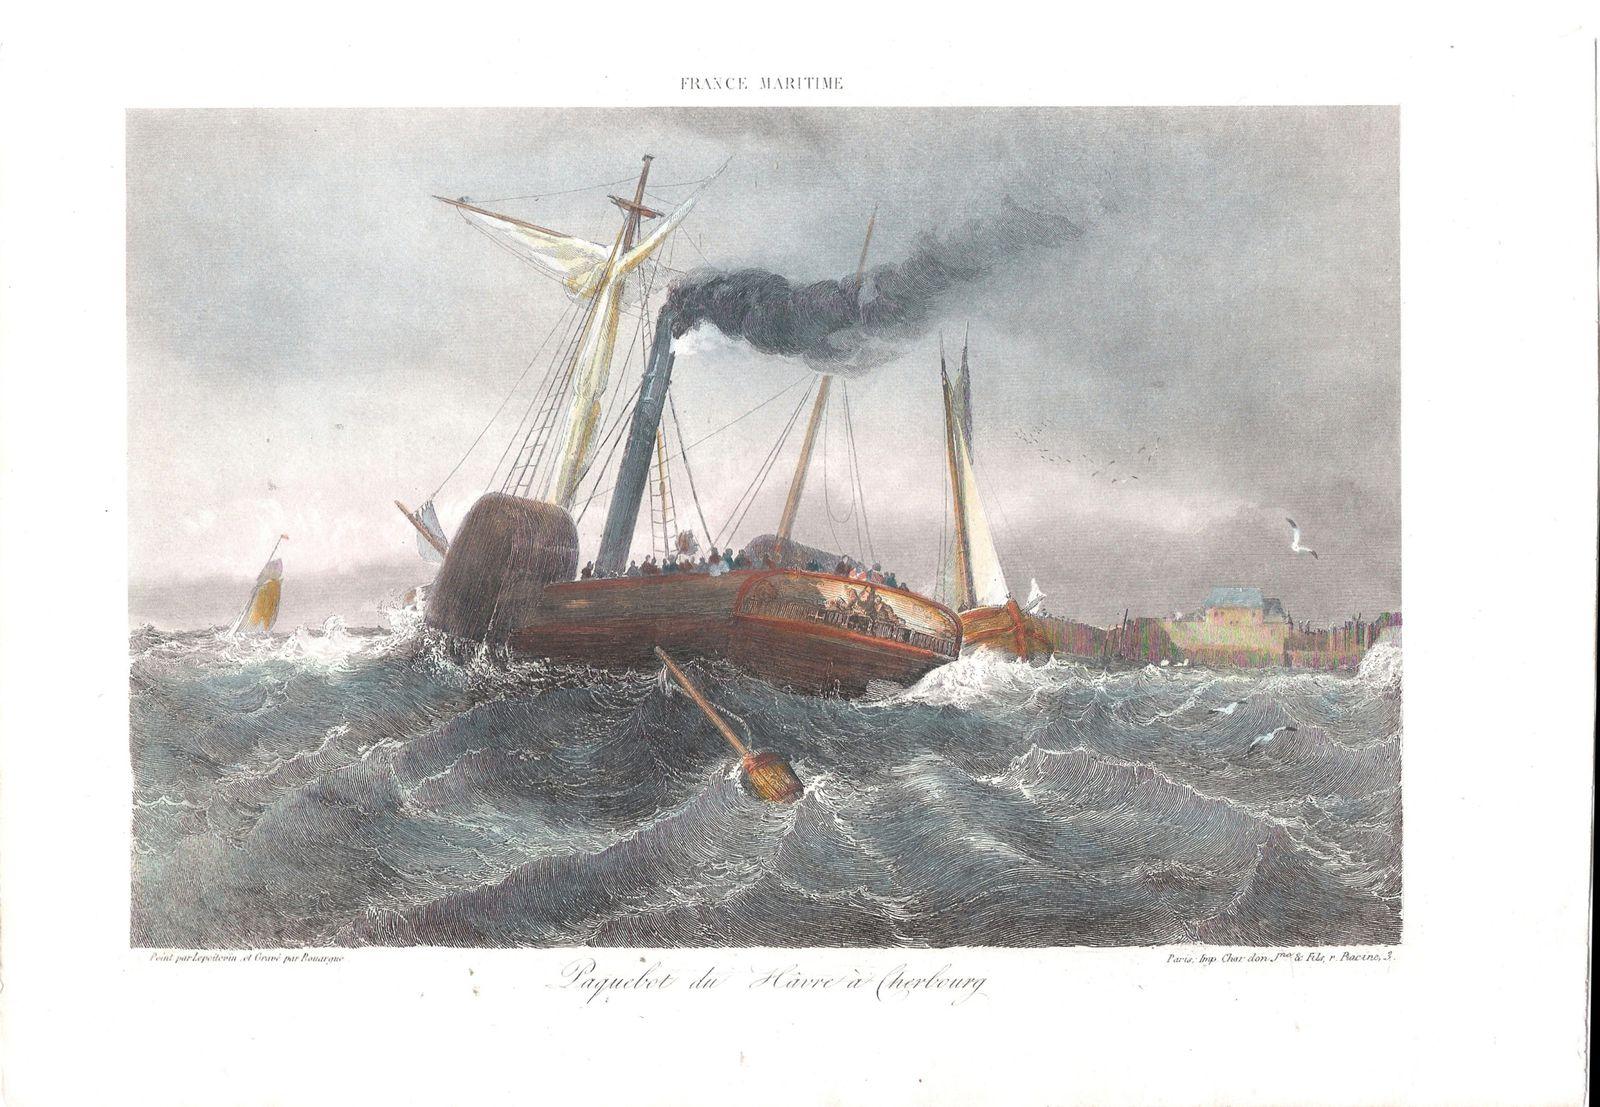 Paquebot du Havre a Cherbourg  (Navire non identifiè)